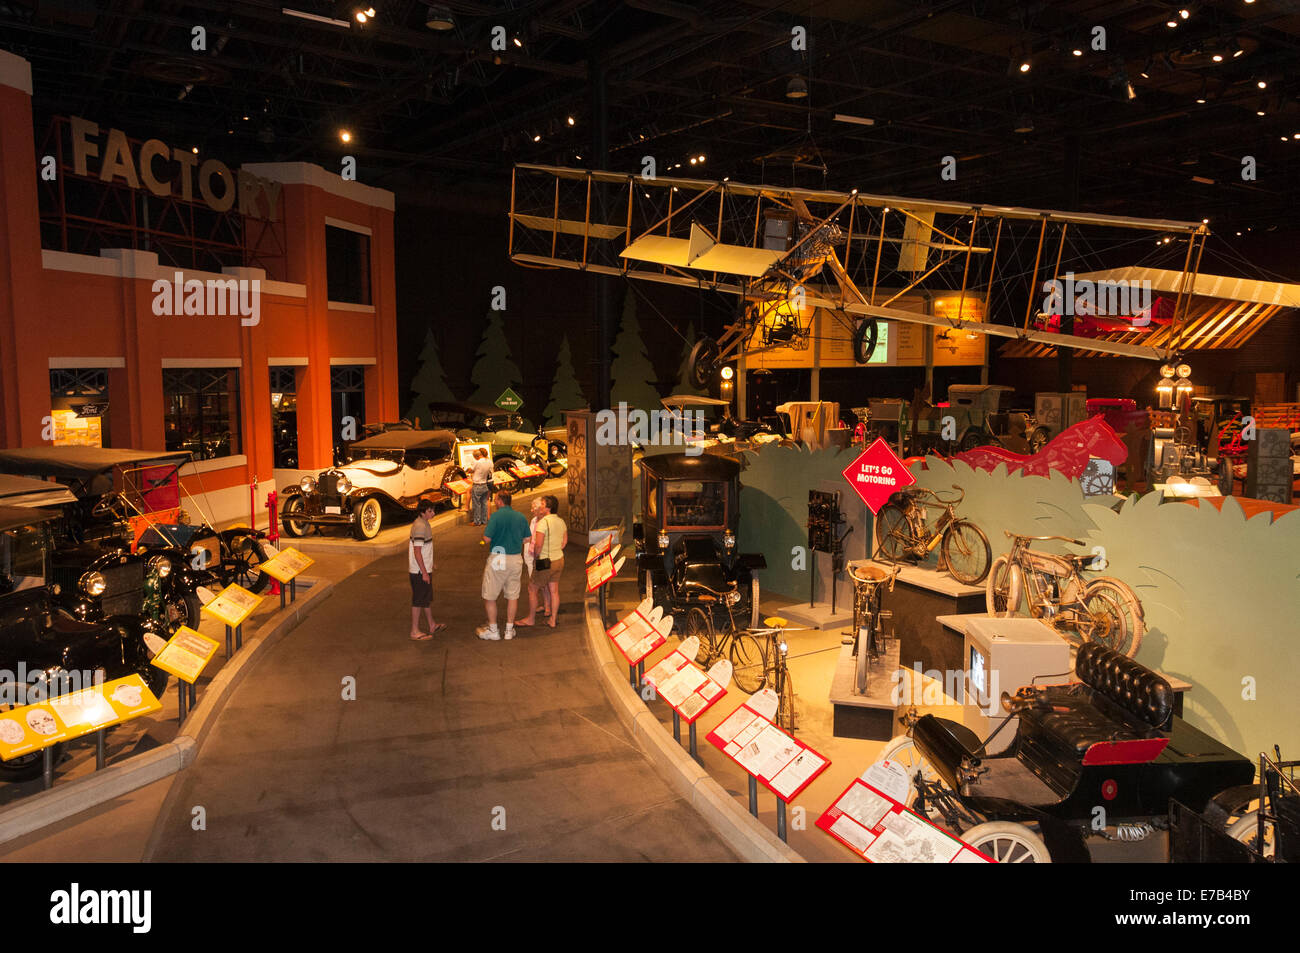 Elk203-5676 Wetaskiwin, Alberta, Canadá, museo Reynolds-Alberta, automóviles antiguos Imagen De Stock